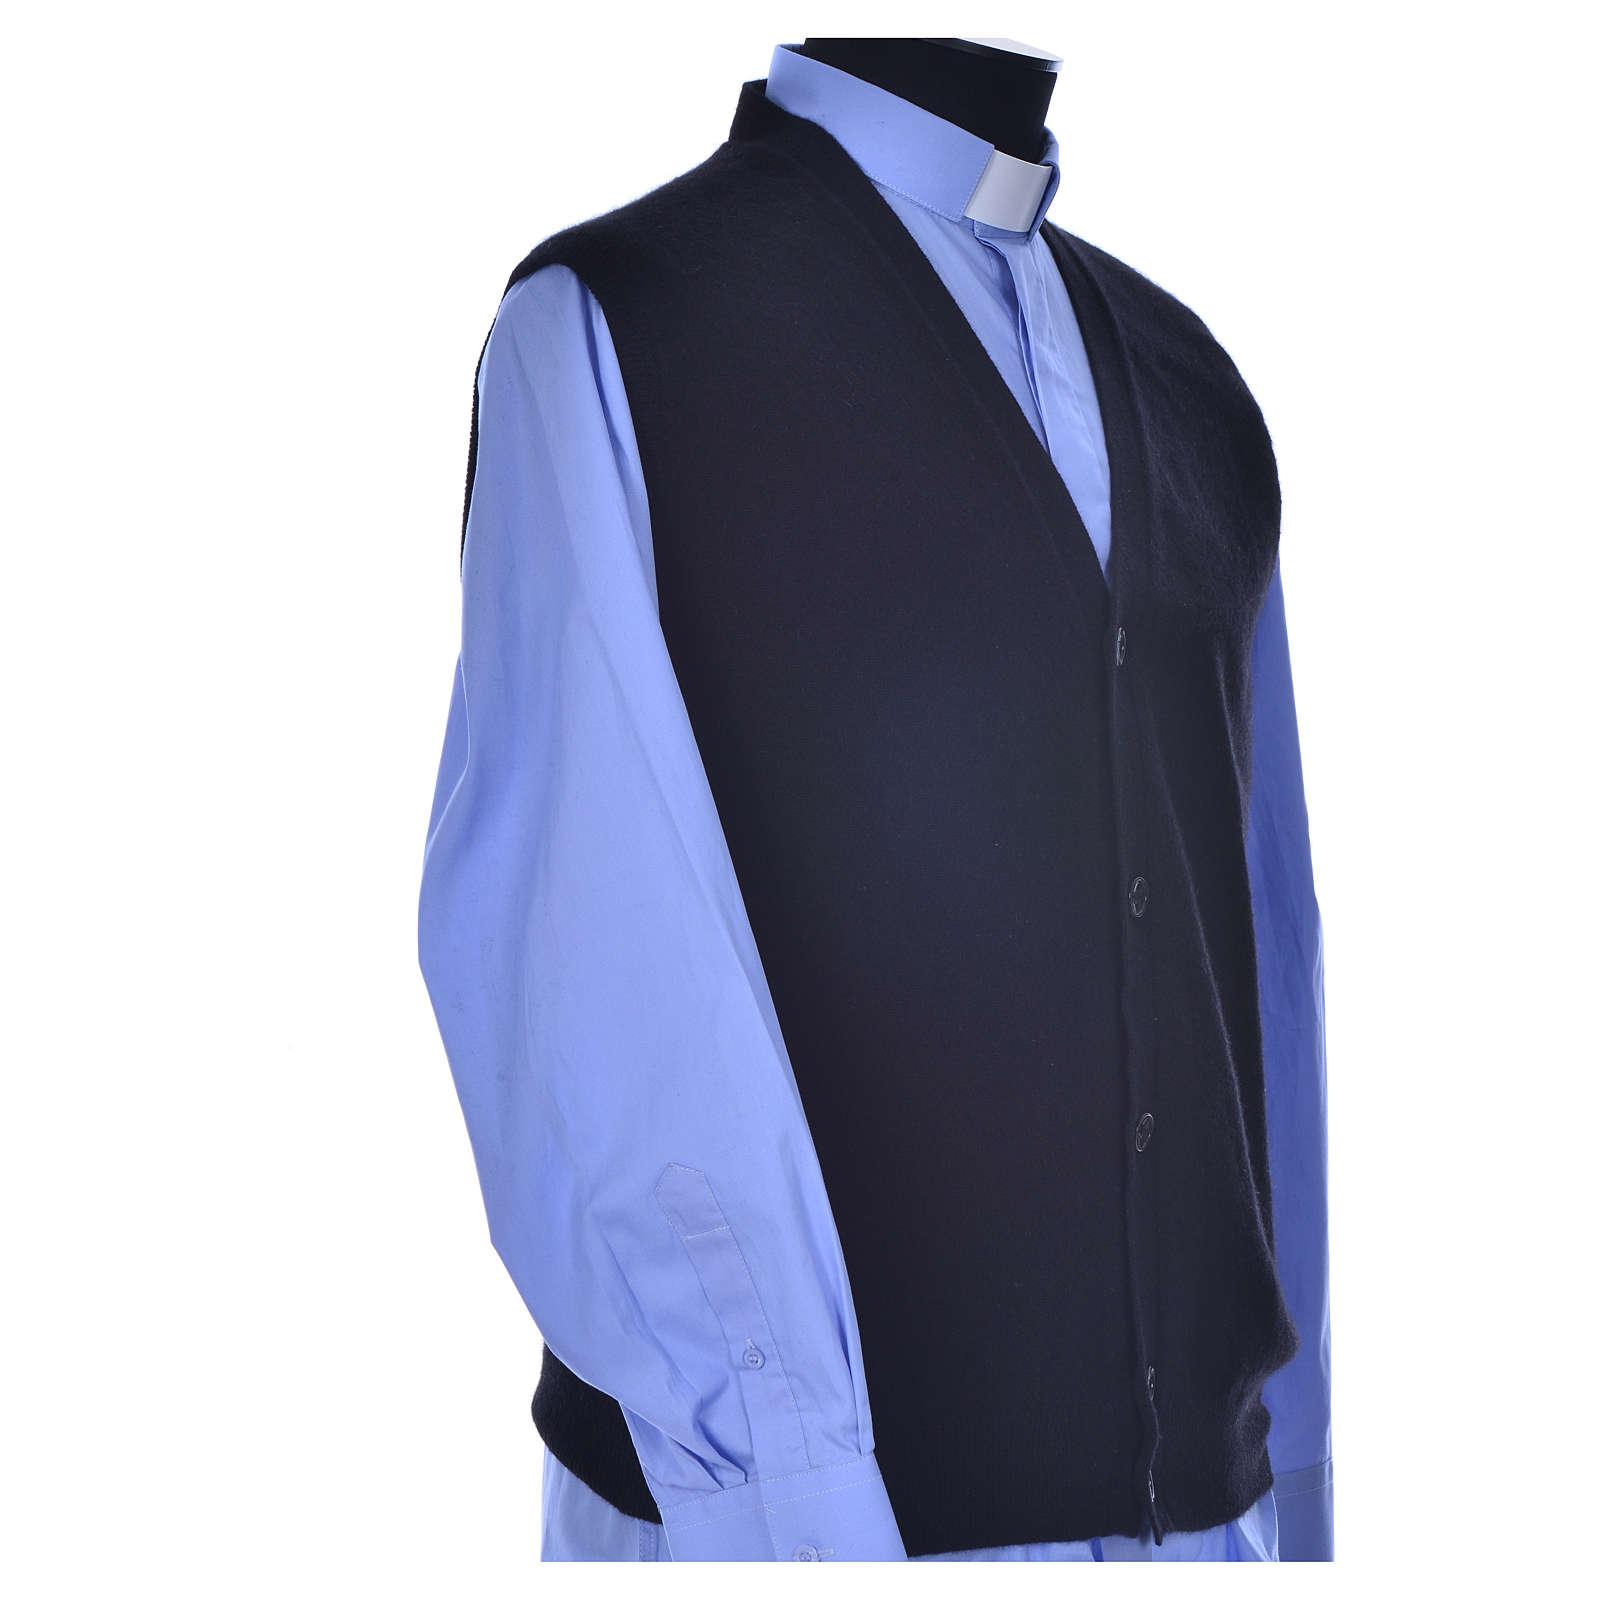 STOCK Sleeveless black cardigan, 100% cashmere wool 4